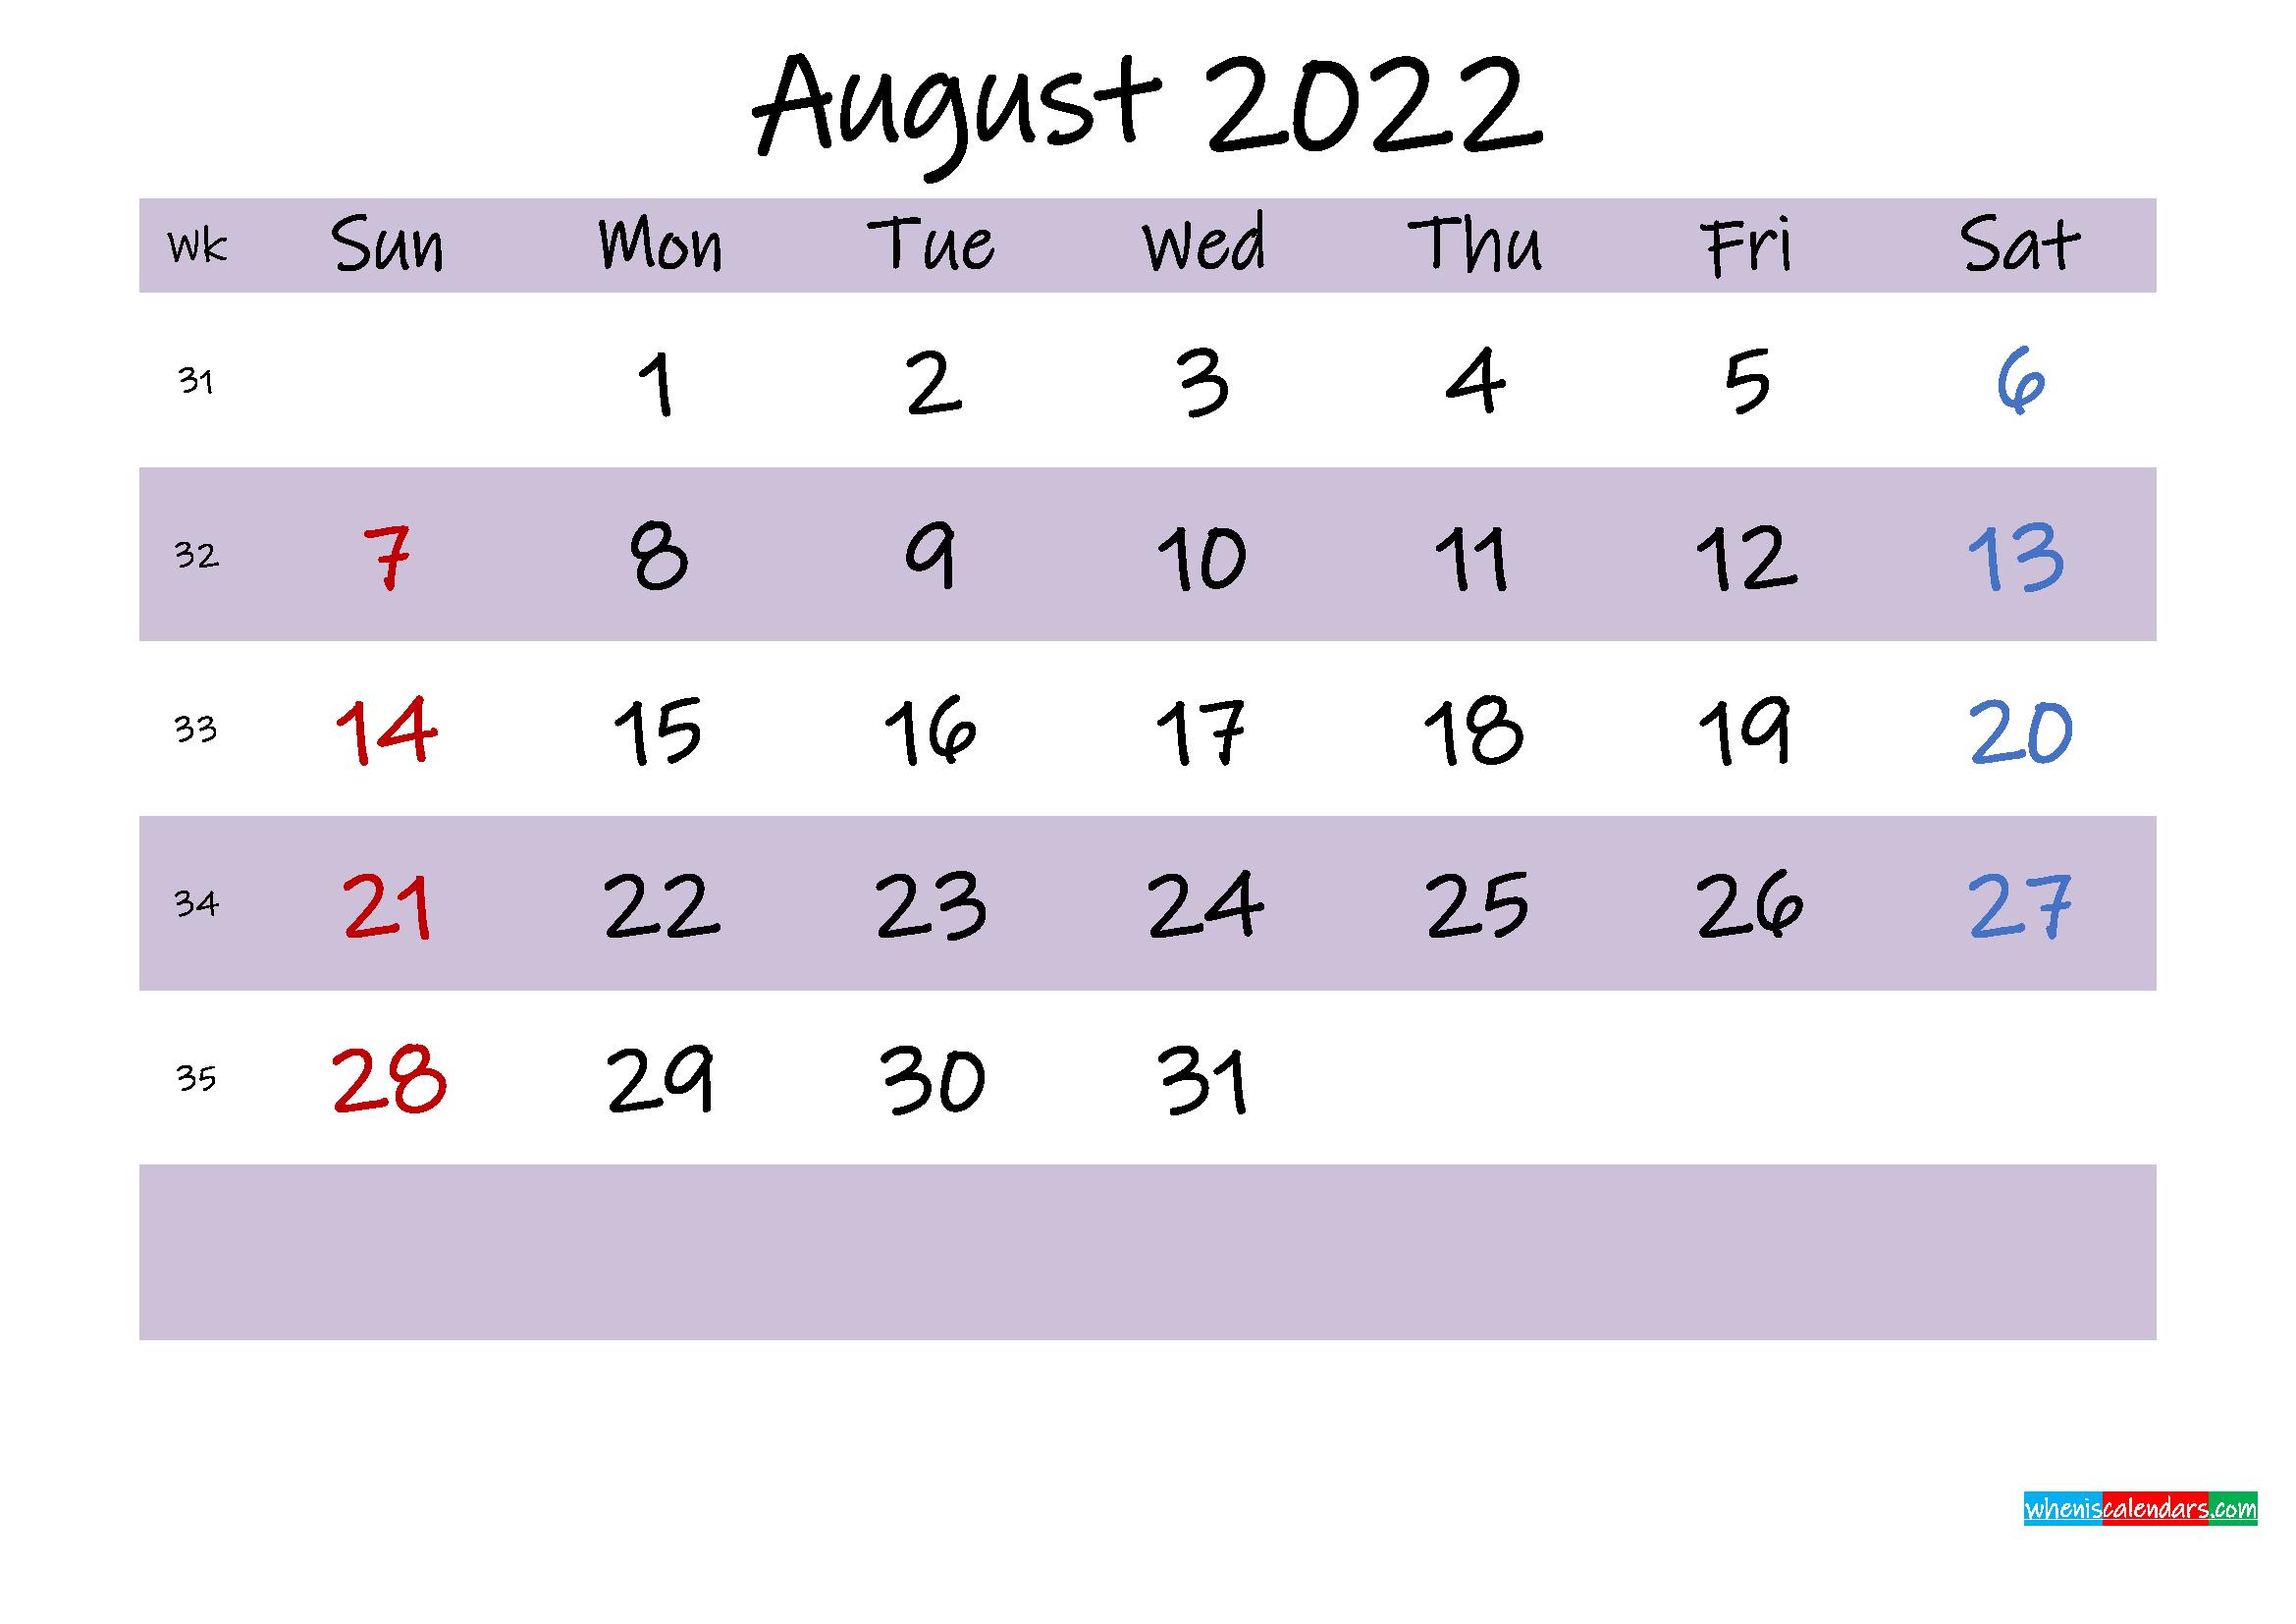 August 2022 Calendar with Holidays Printable